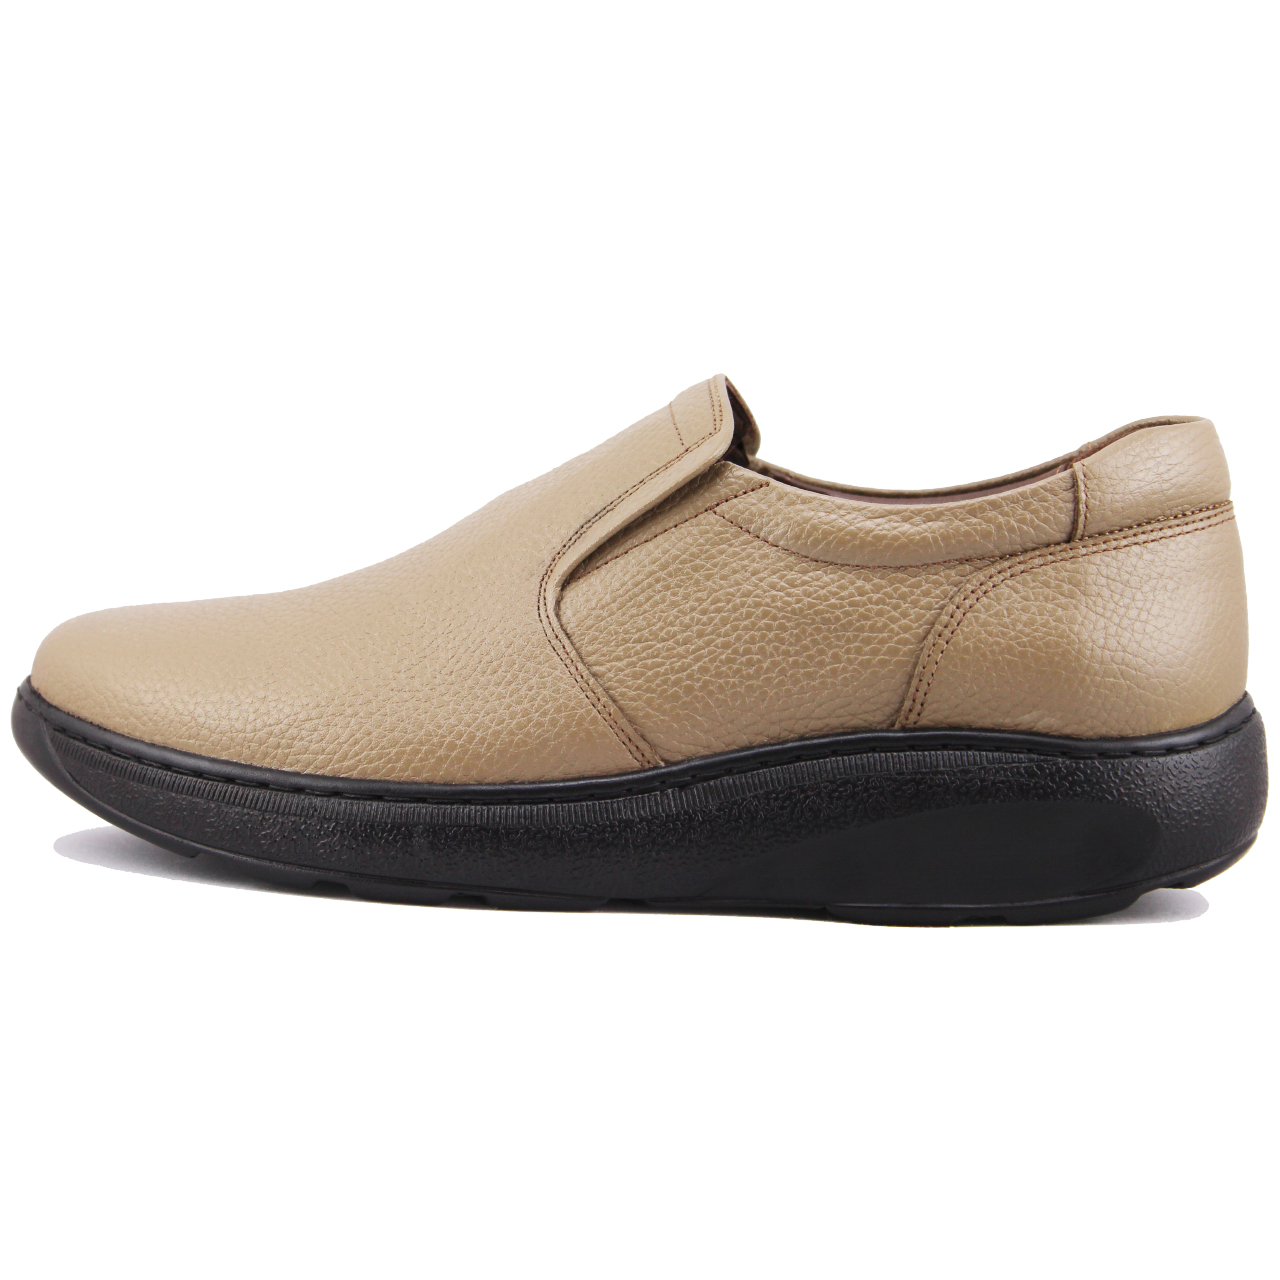 کفش مردانه چرم طبیعی ژاو مدل 2075